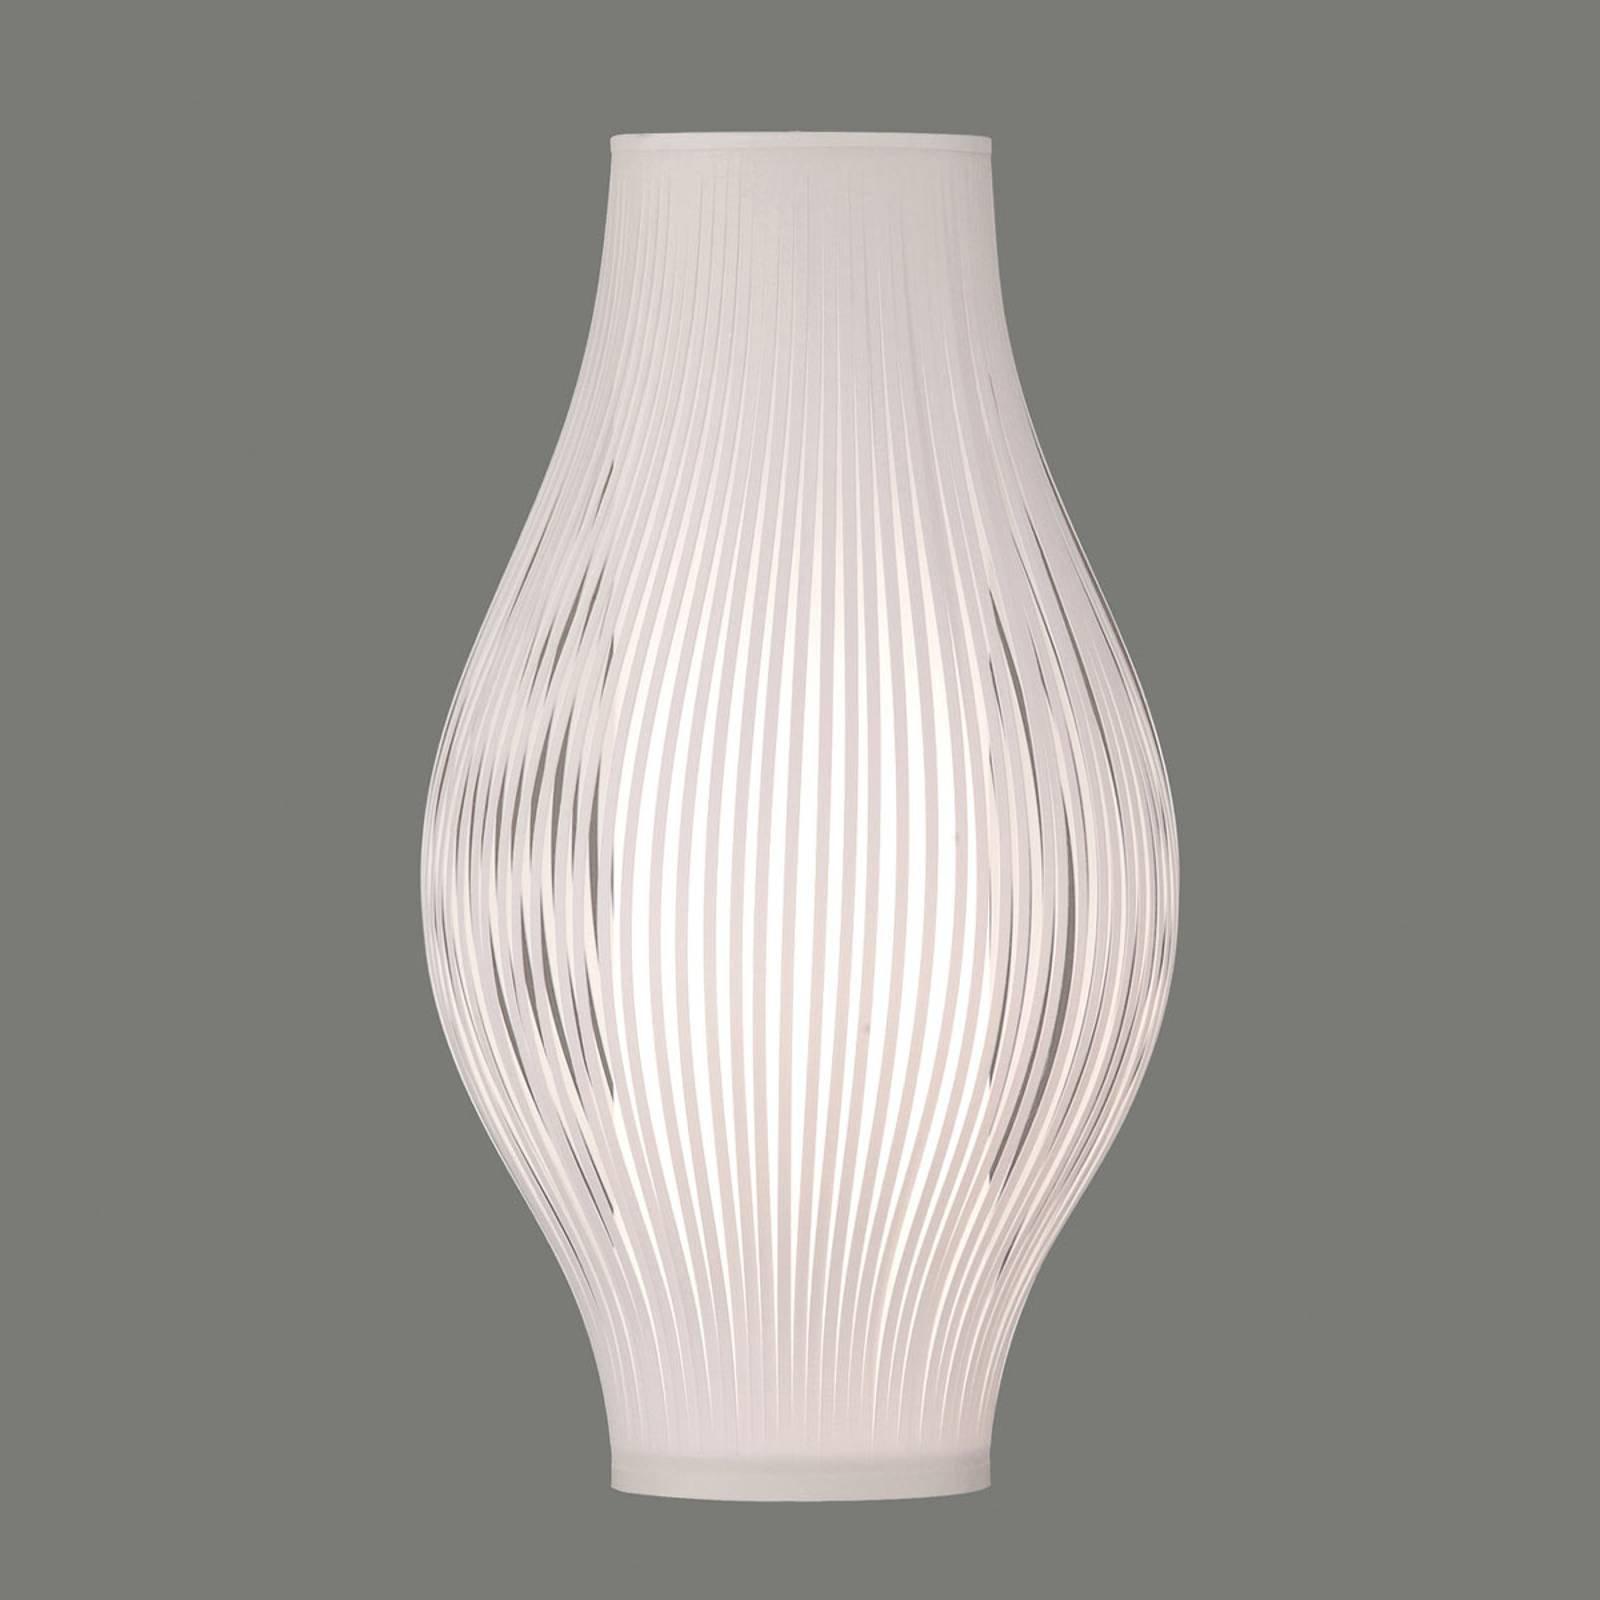 Bordlampe Murta, 51 cm, hvit